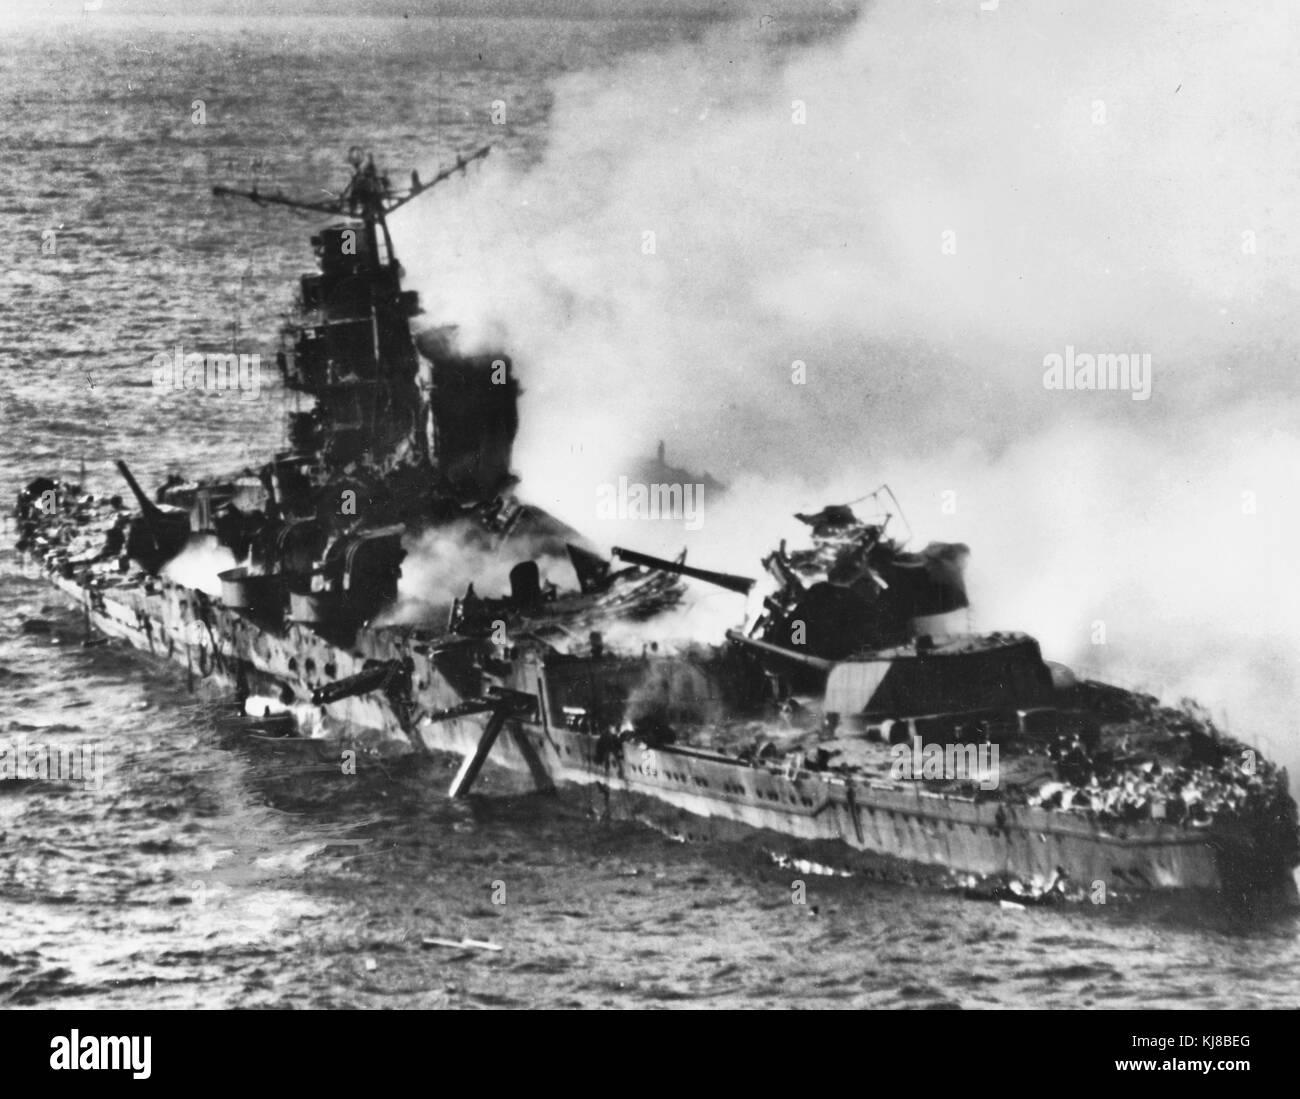 The burning Japanese cruiser Mikuma, 6 June 1942. Japanese heavy cruiser Mikuma, photographed from a USS Enterprise - Stock Image